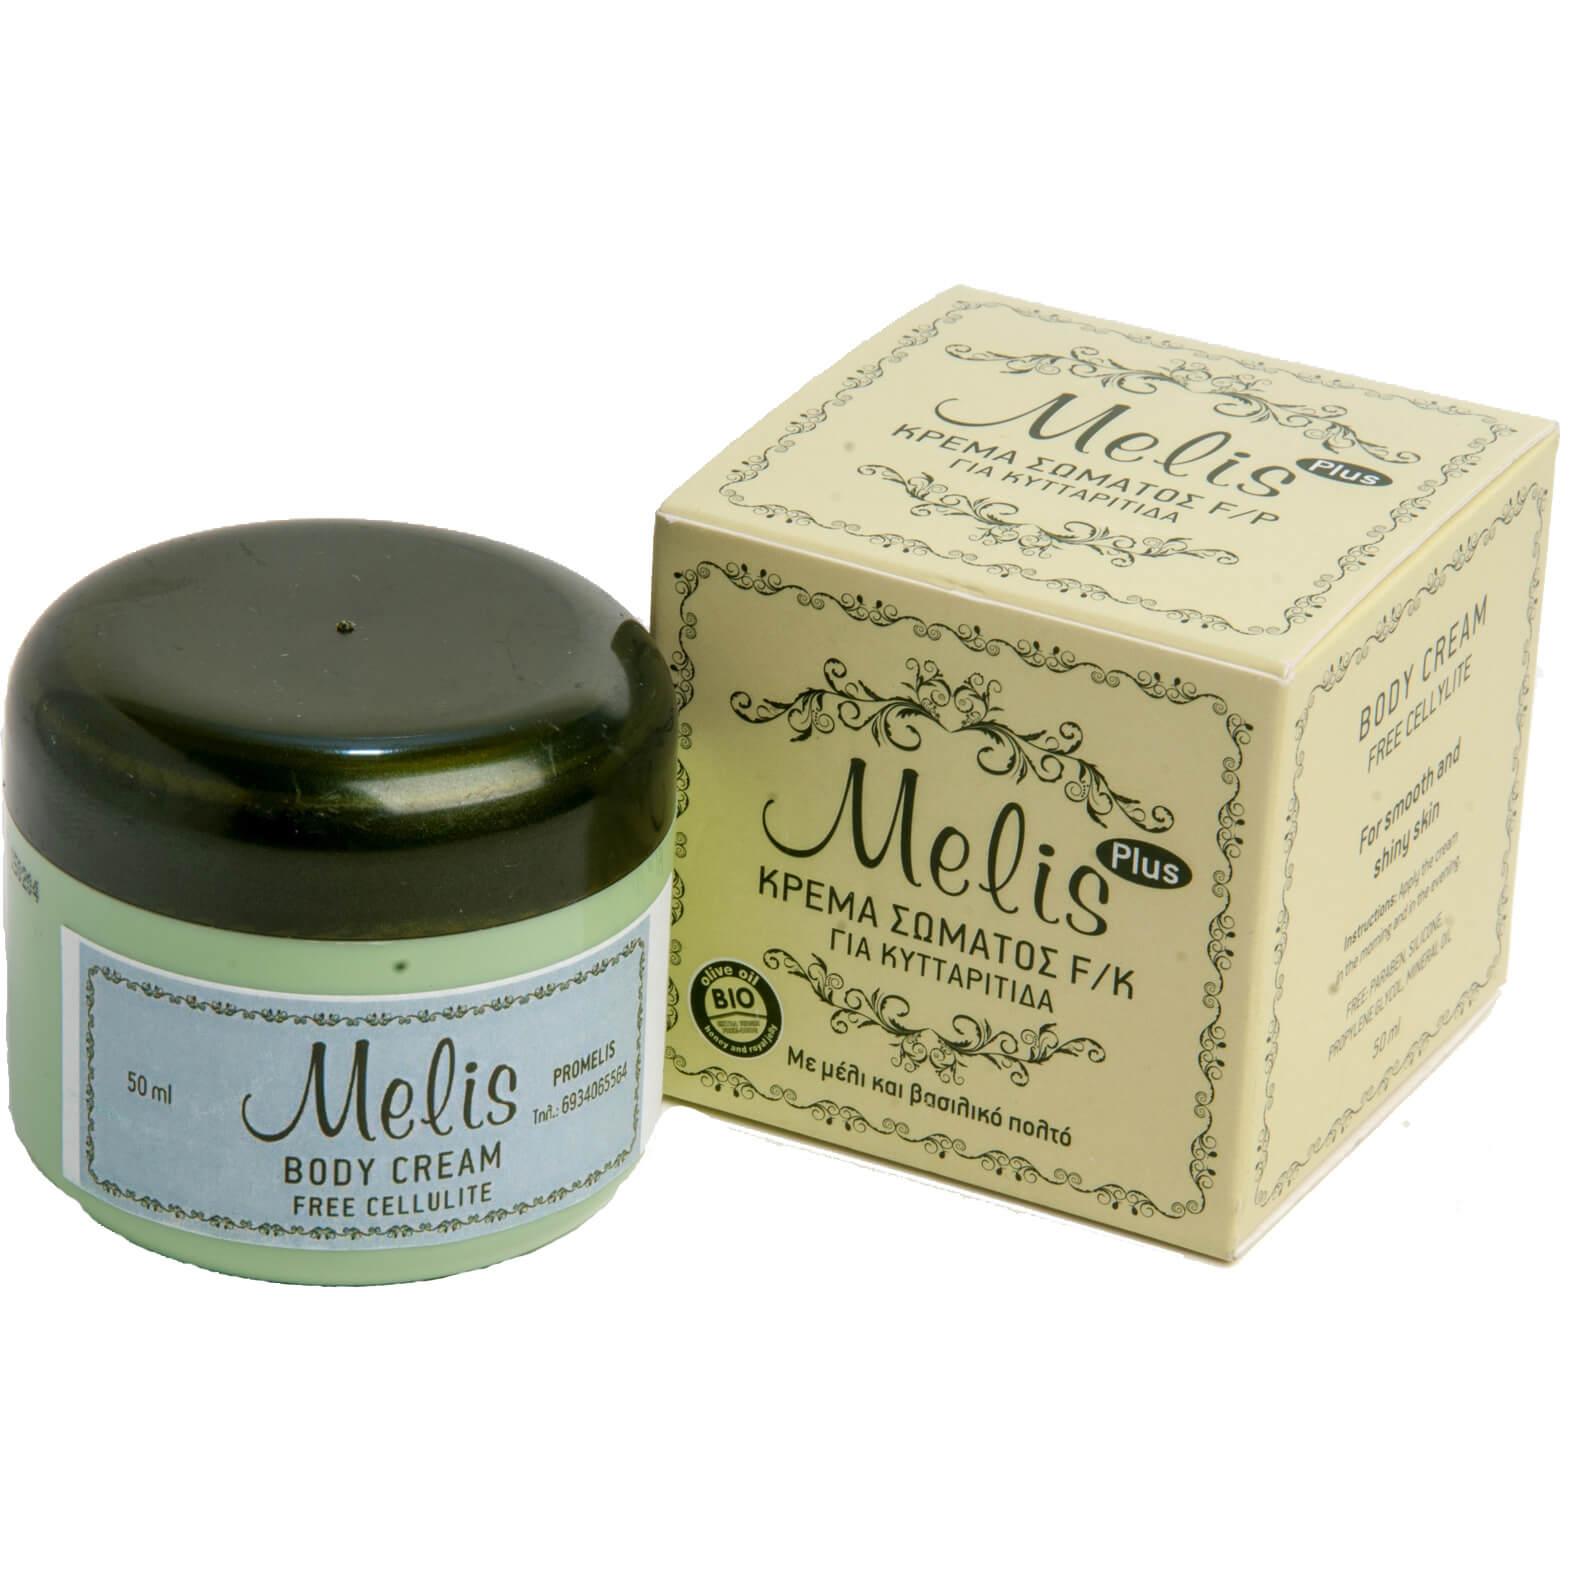 Melis Plus Body Cream Free Cellulite Κρέμα Σώματος για Κυτταρίτιδα με Μέλι και Βασιλικό Πολτό 200ml